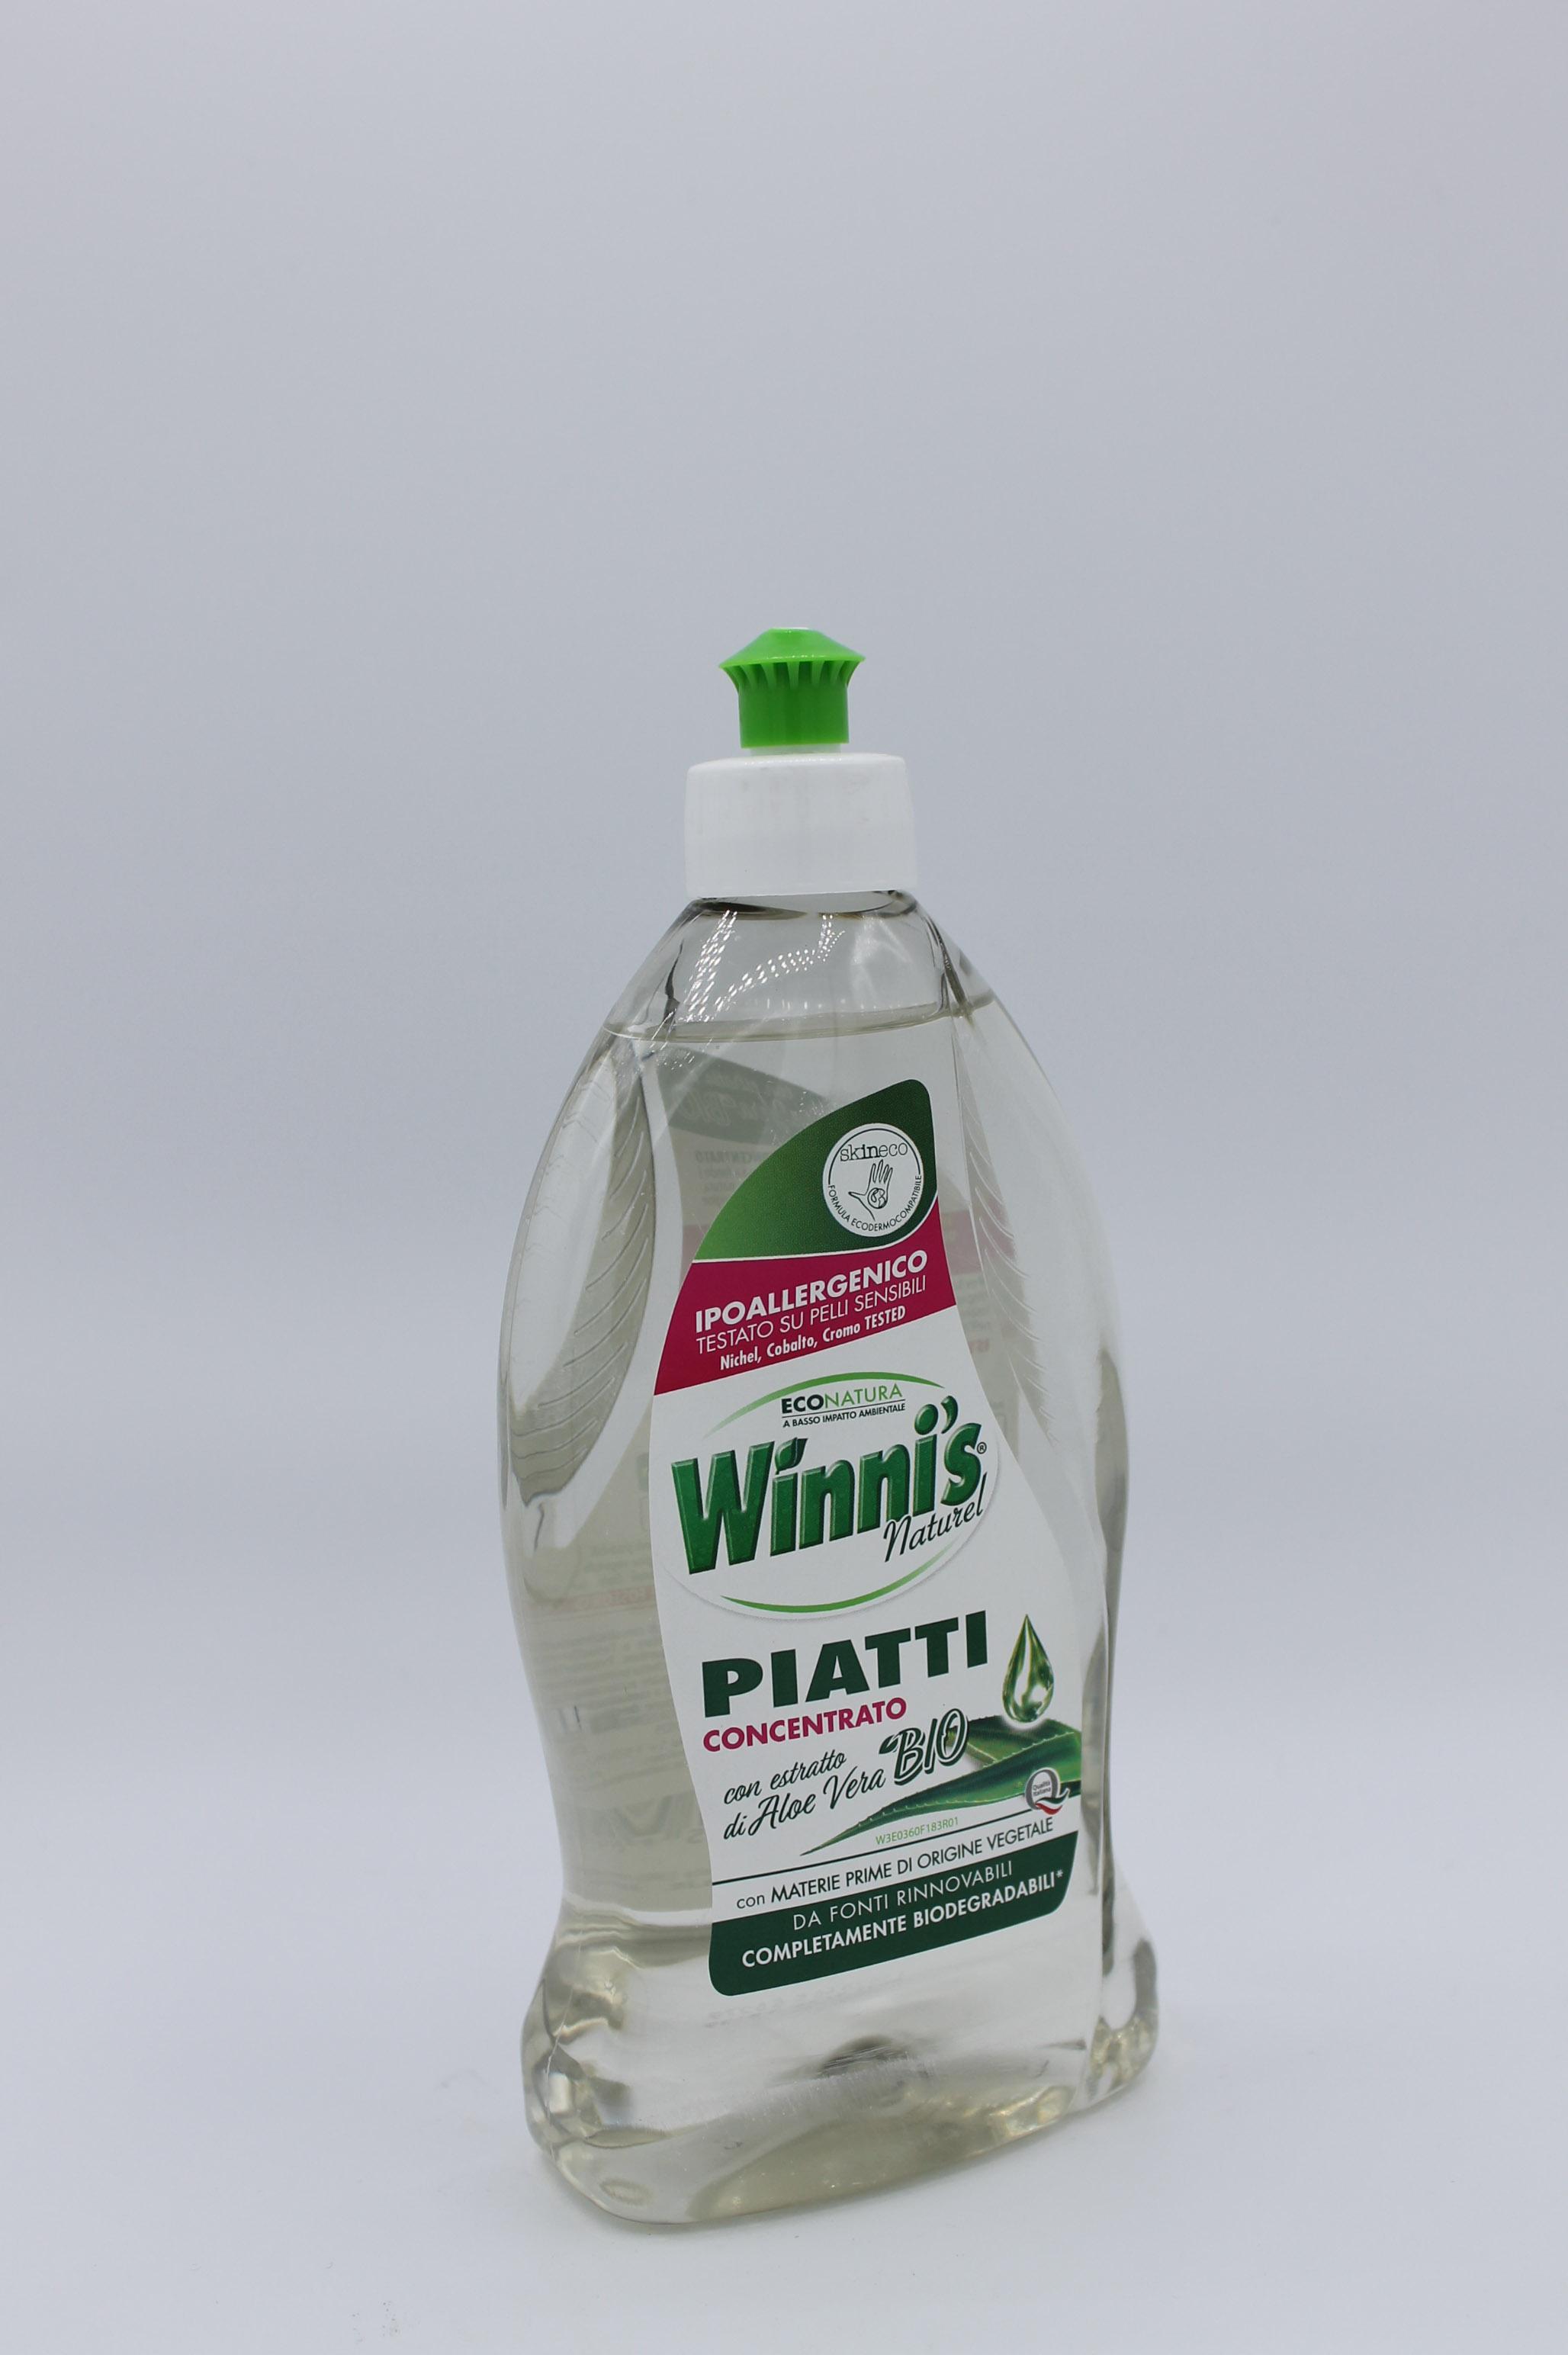 Winni's detersivo piatti aloe 500ml.